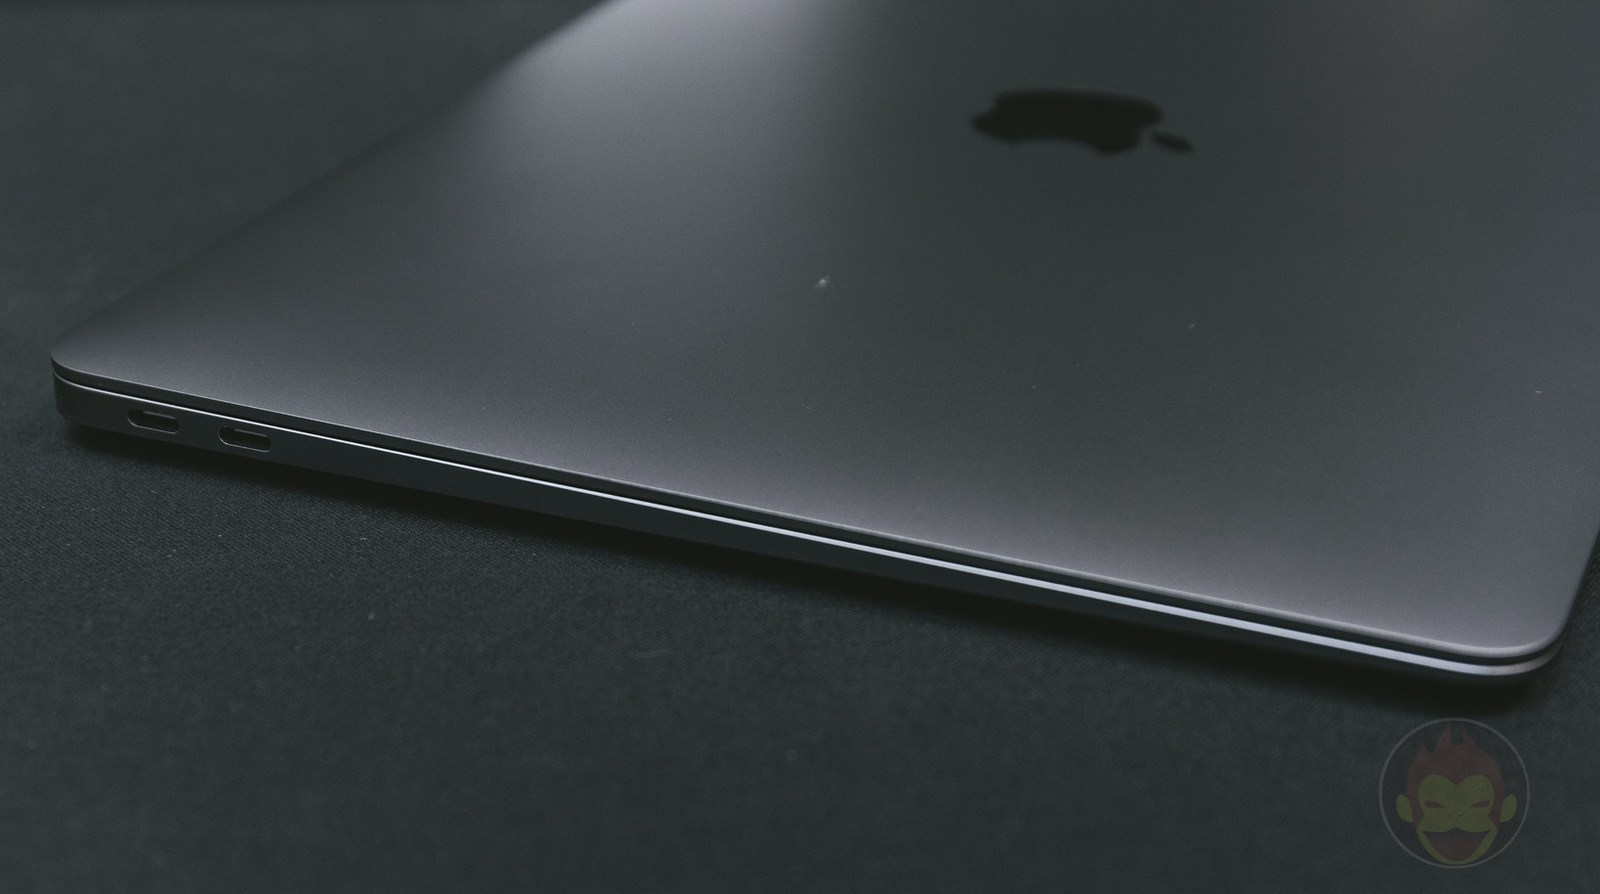 Using-MacBook-Air-day-one-03.jpg